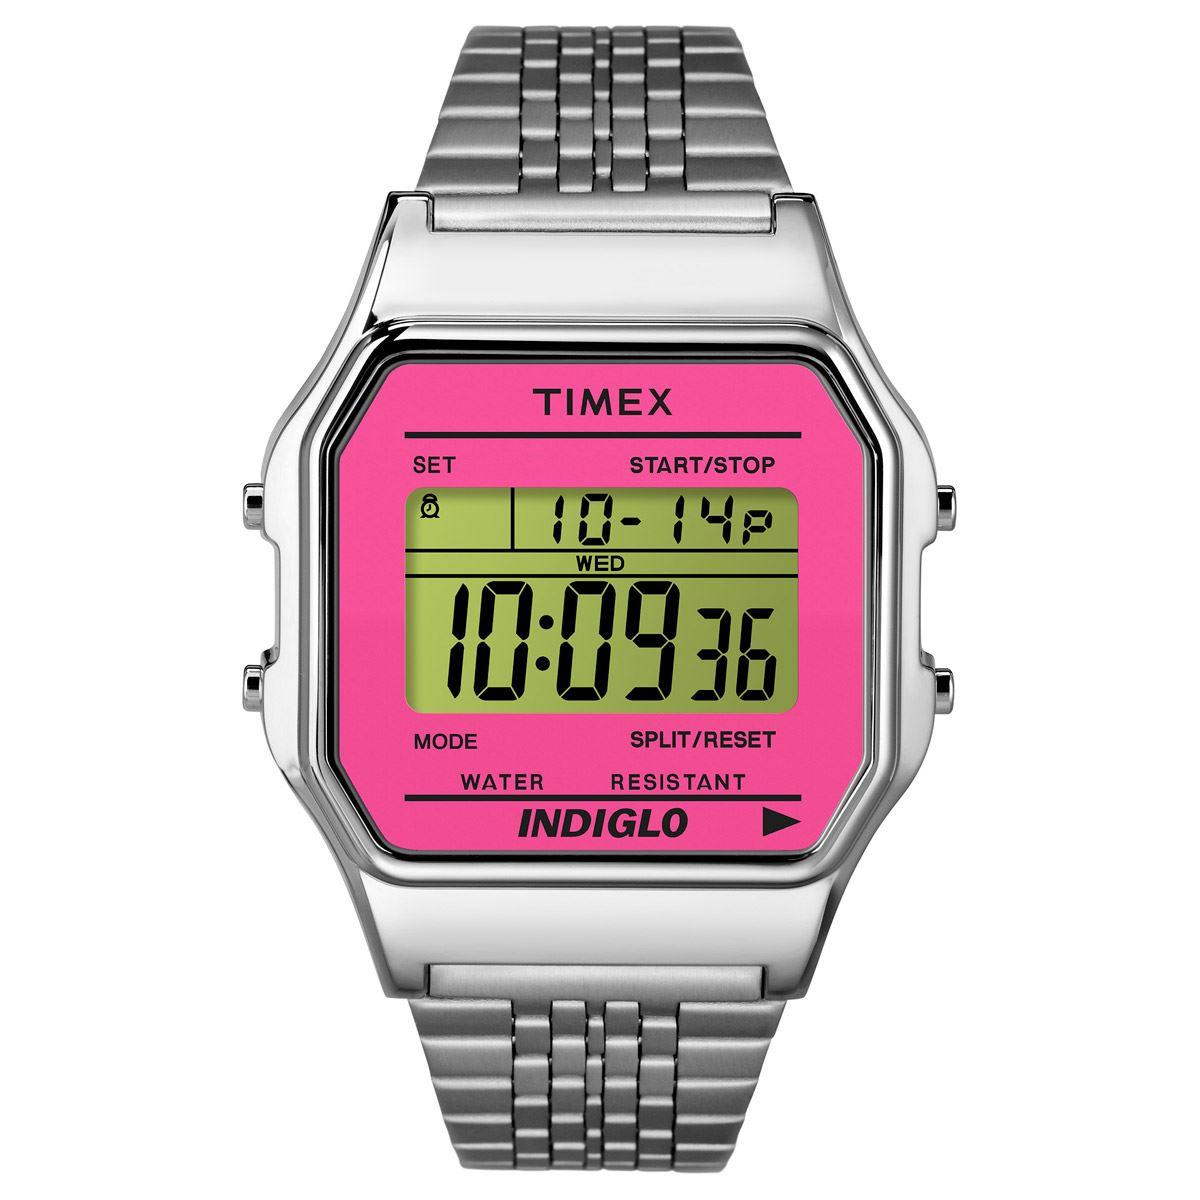 Orologio donna Timex INDIGLO TW2P65000